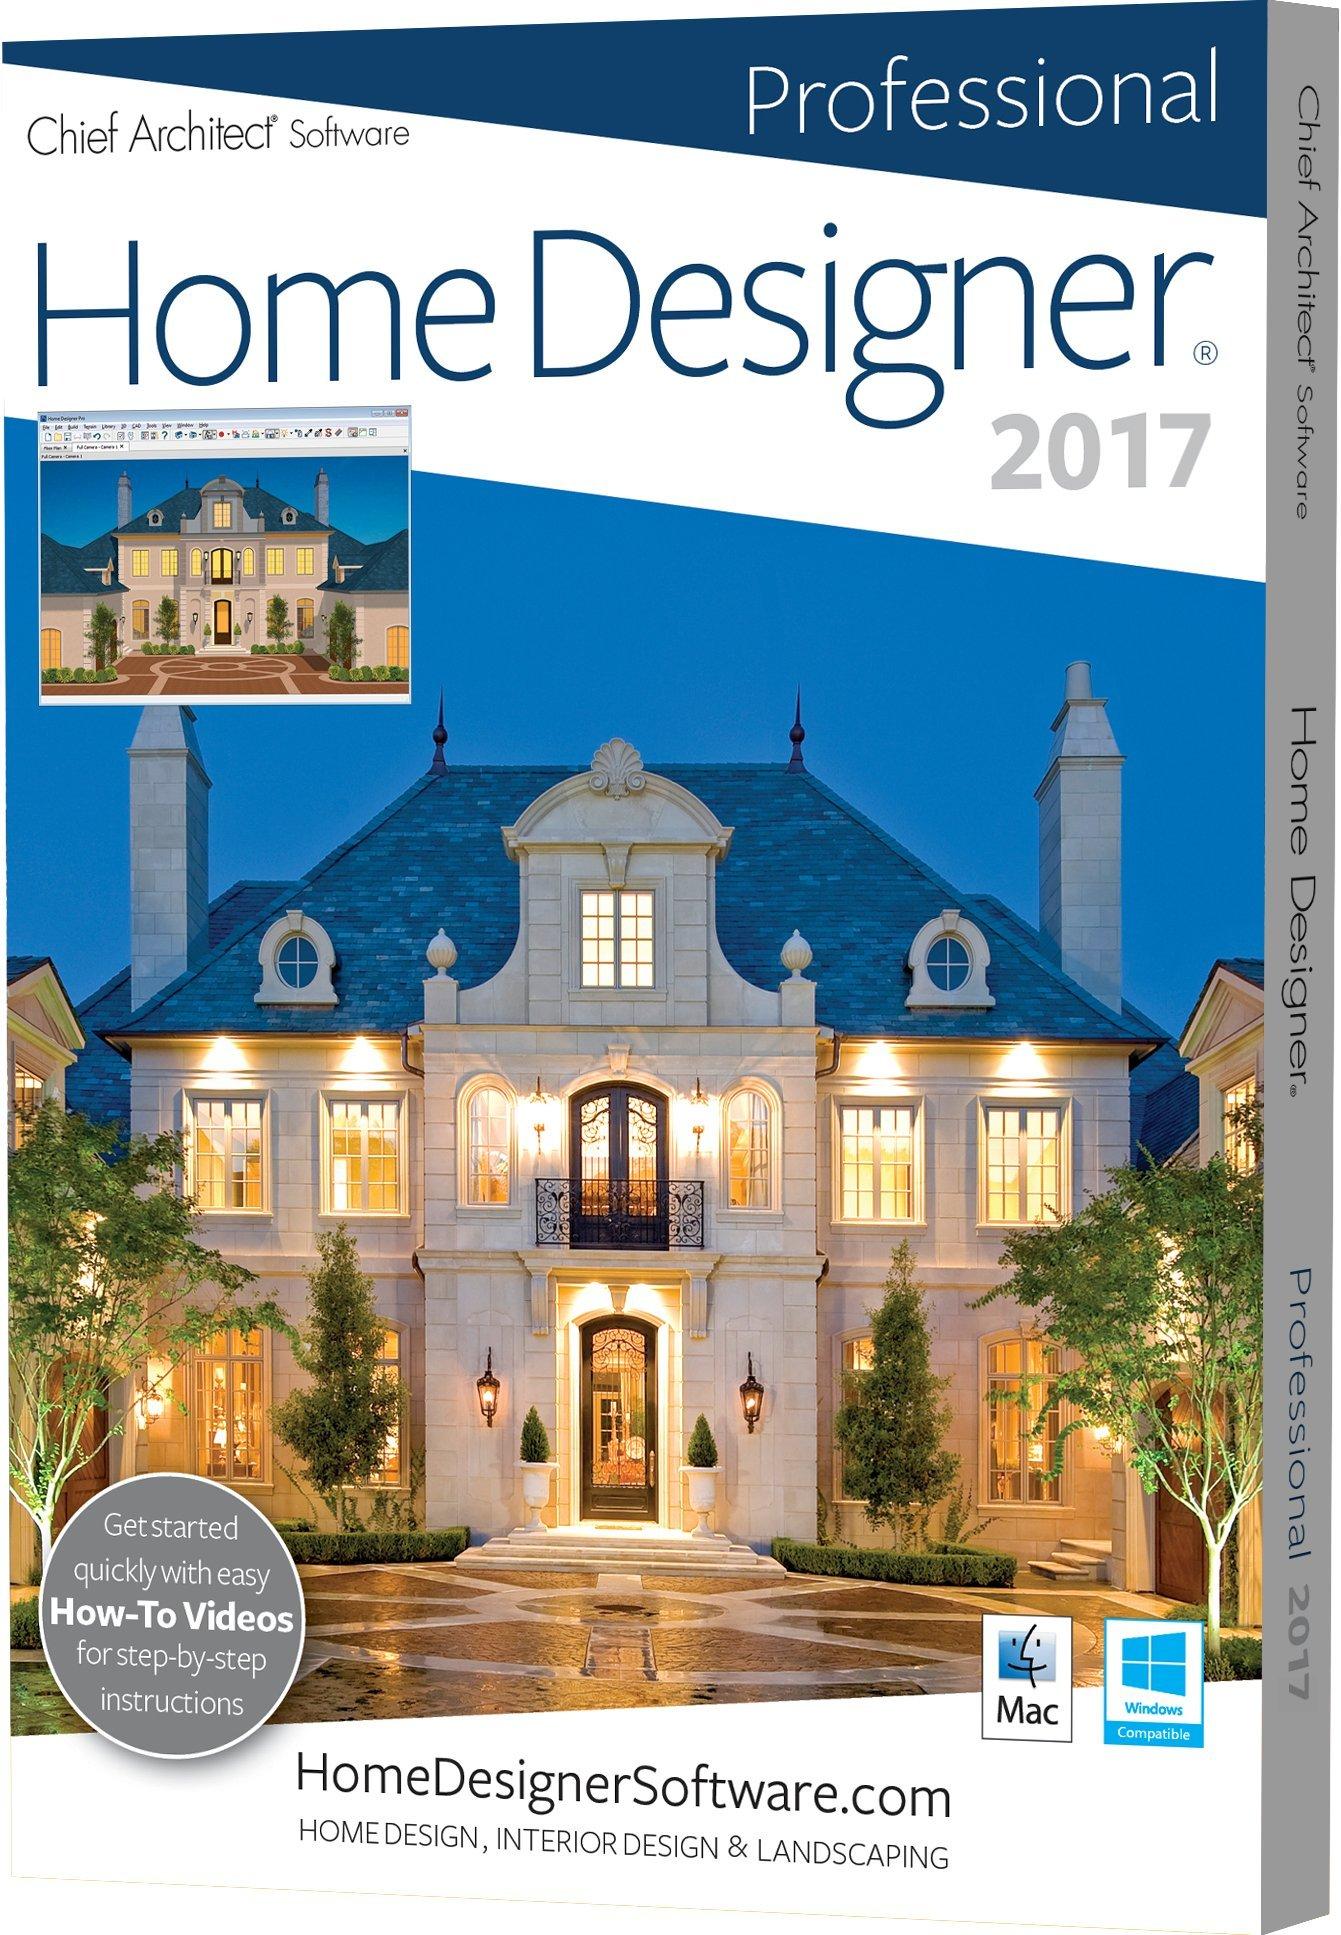 Chief Architect Home Designer Pro 2017 Pc Disc Fox And Grapes